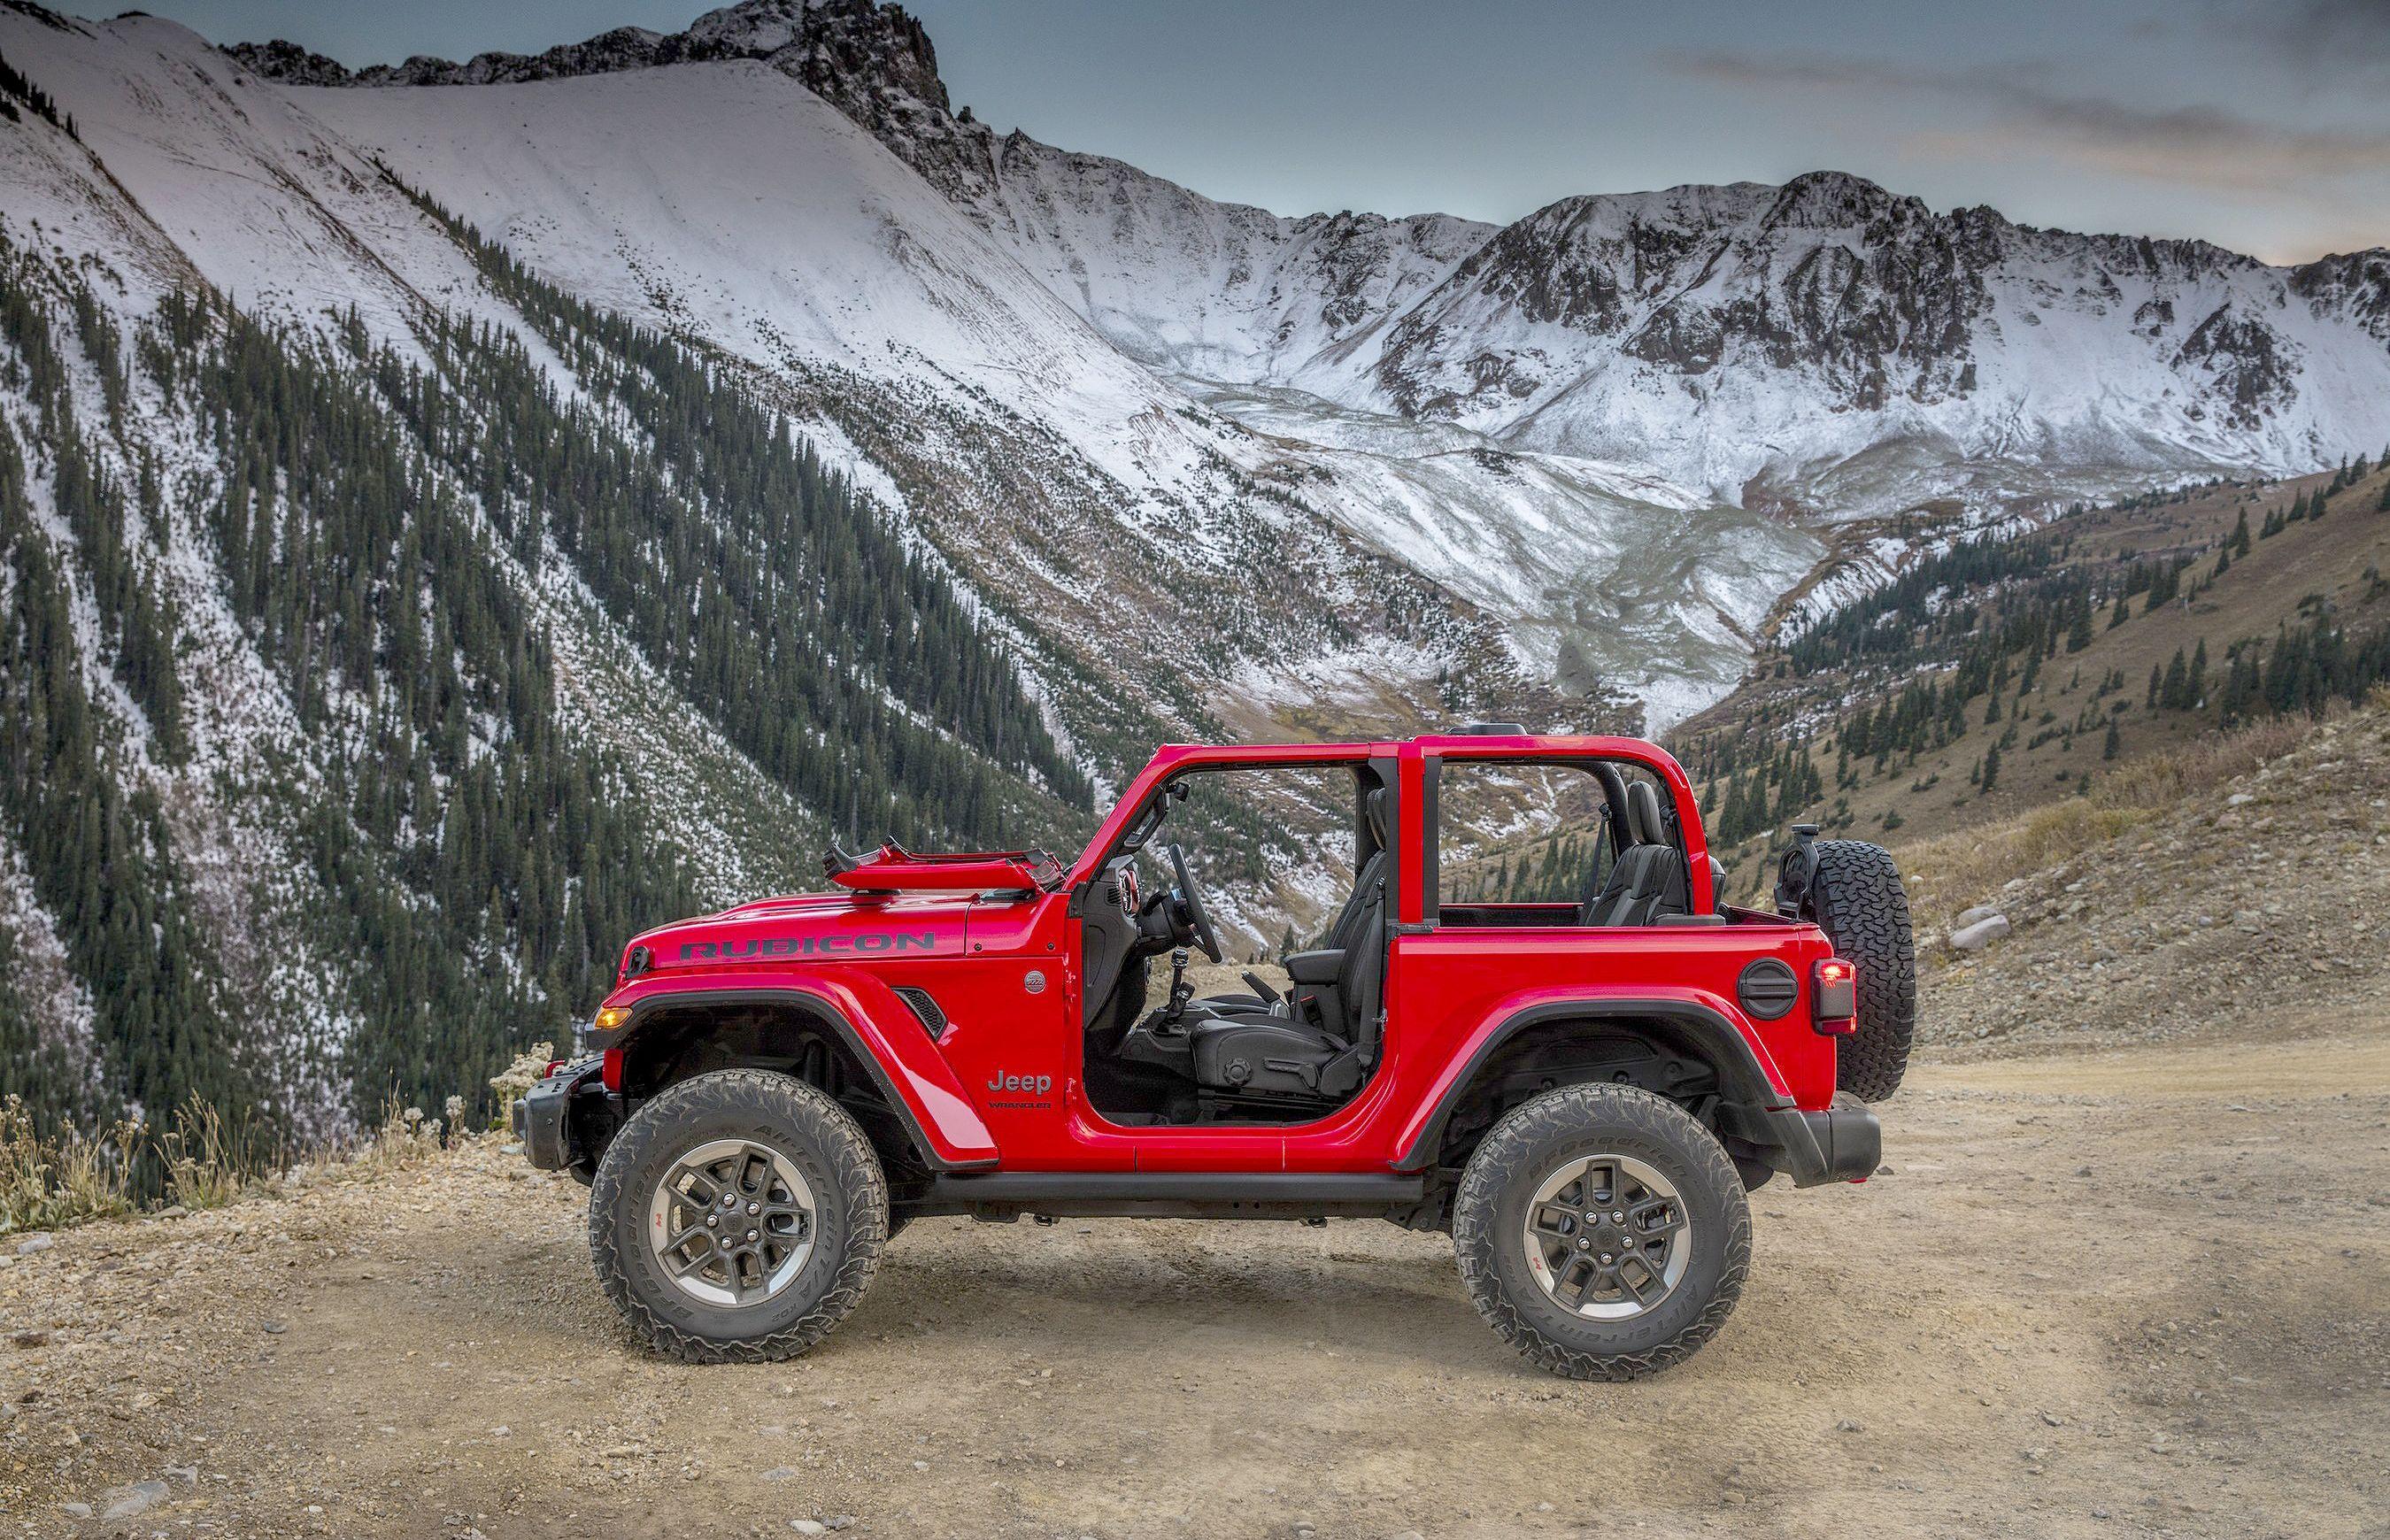 Fca Us Llc 2018 Jeep Wrangler Side Jpg 2700 1740 New Jeep Wrangler Jeep Wrangler Rubicon Wrangler Jl